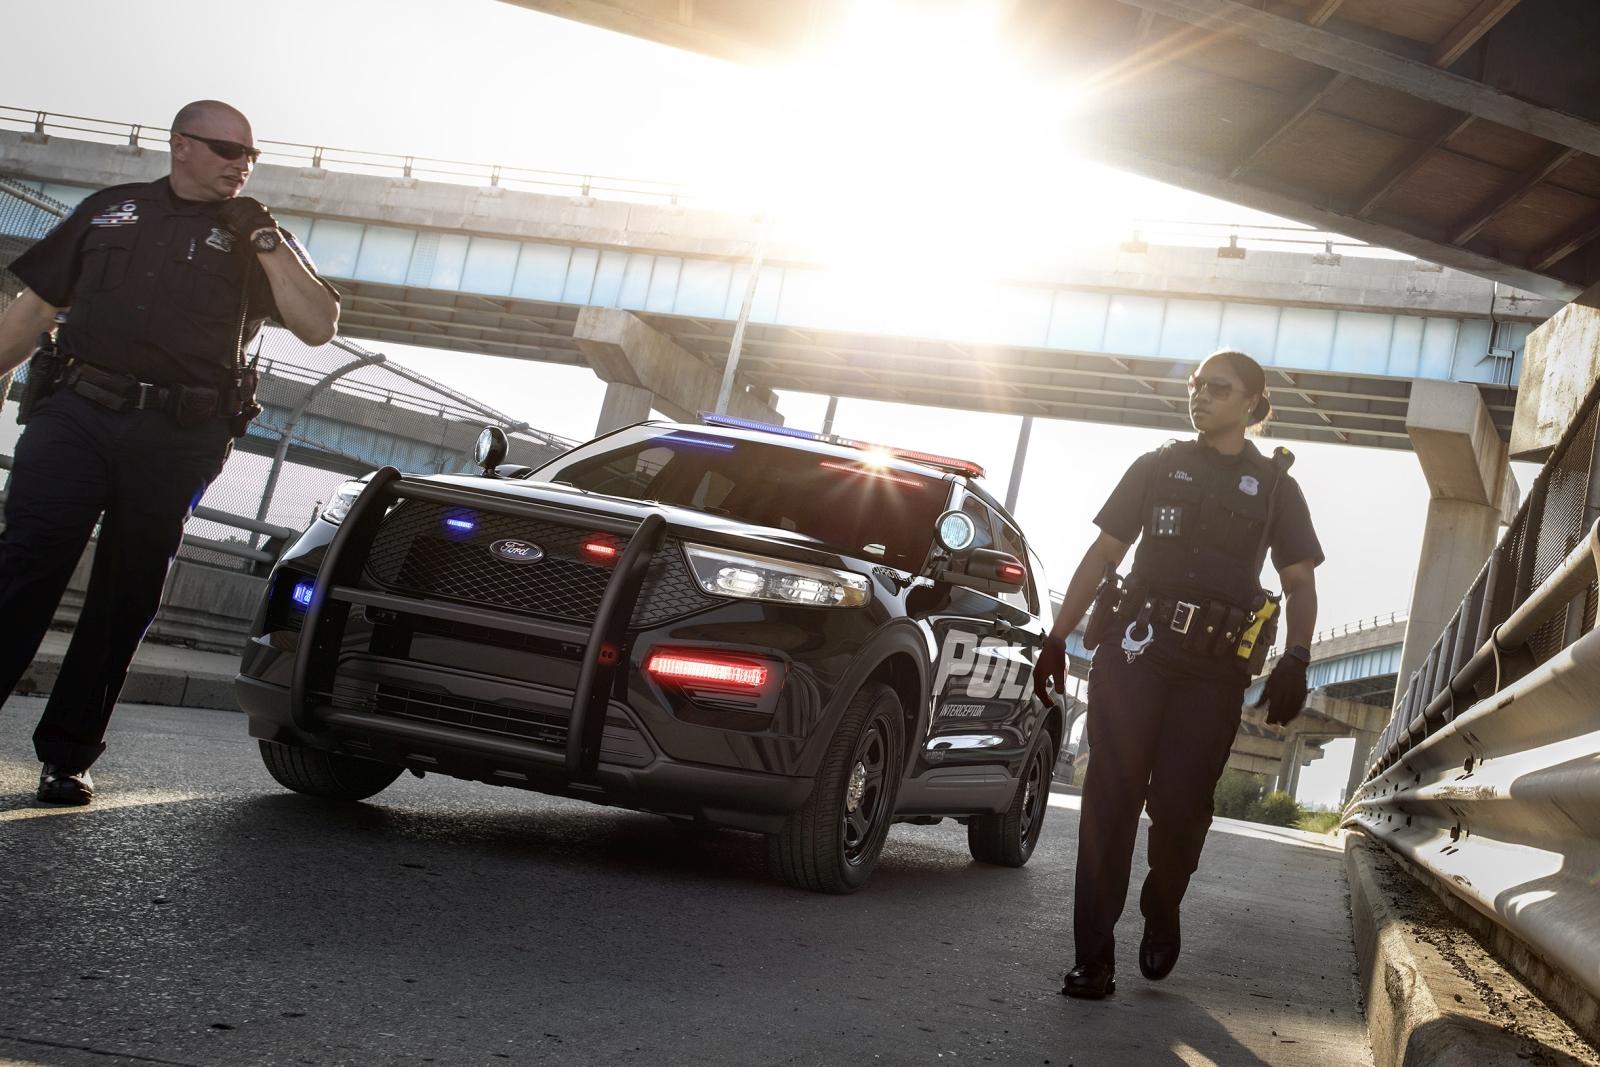 All-New 2020 Ford Police Interceptor Utility Hybrid